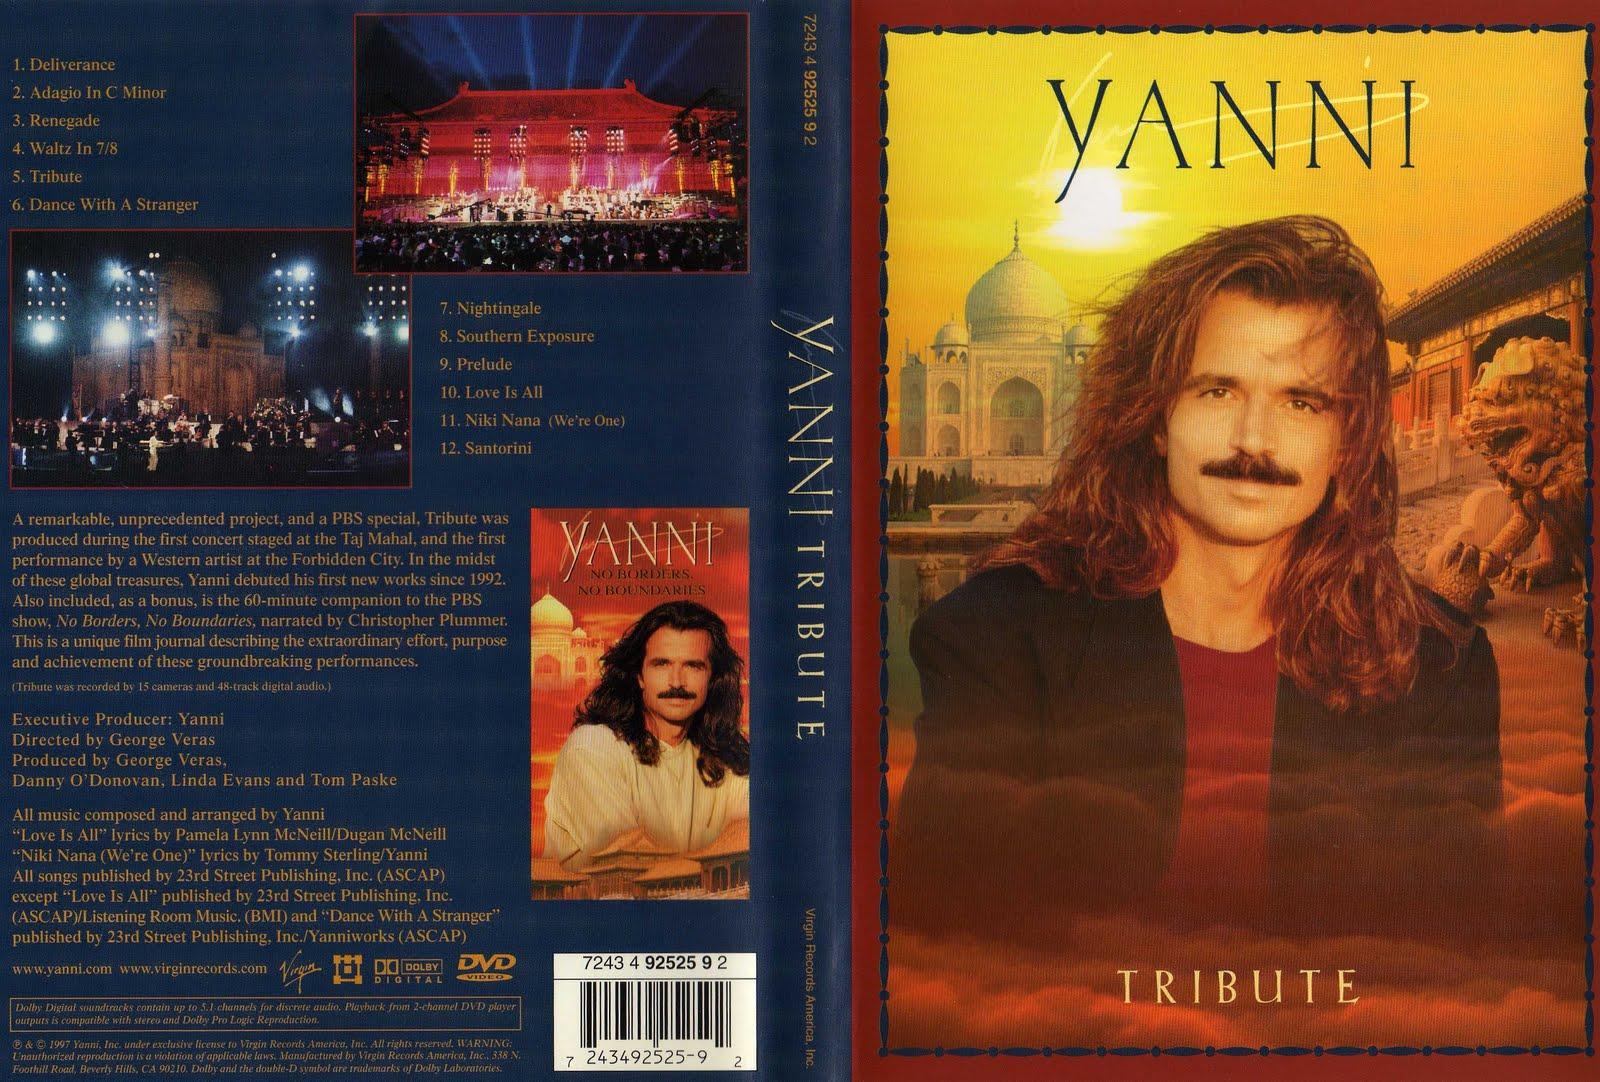 yanni mp3 gratis: